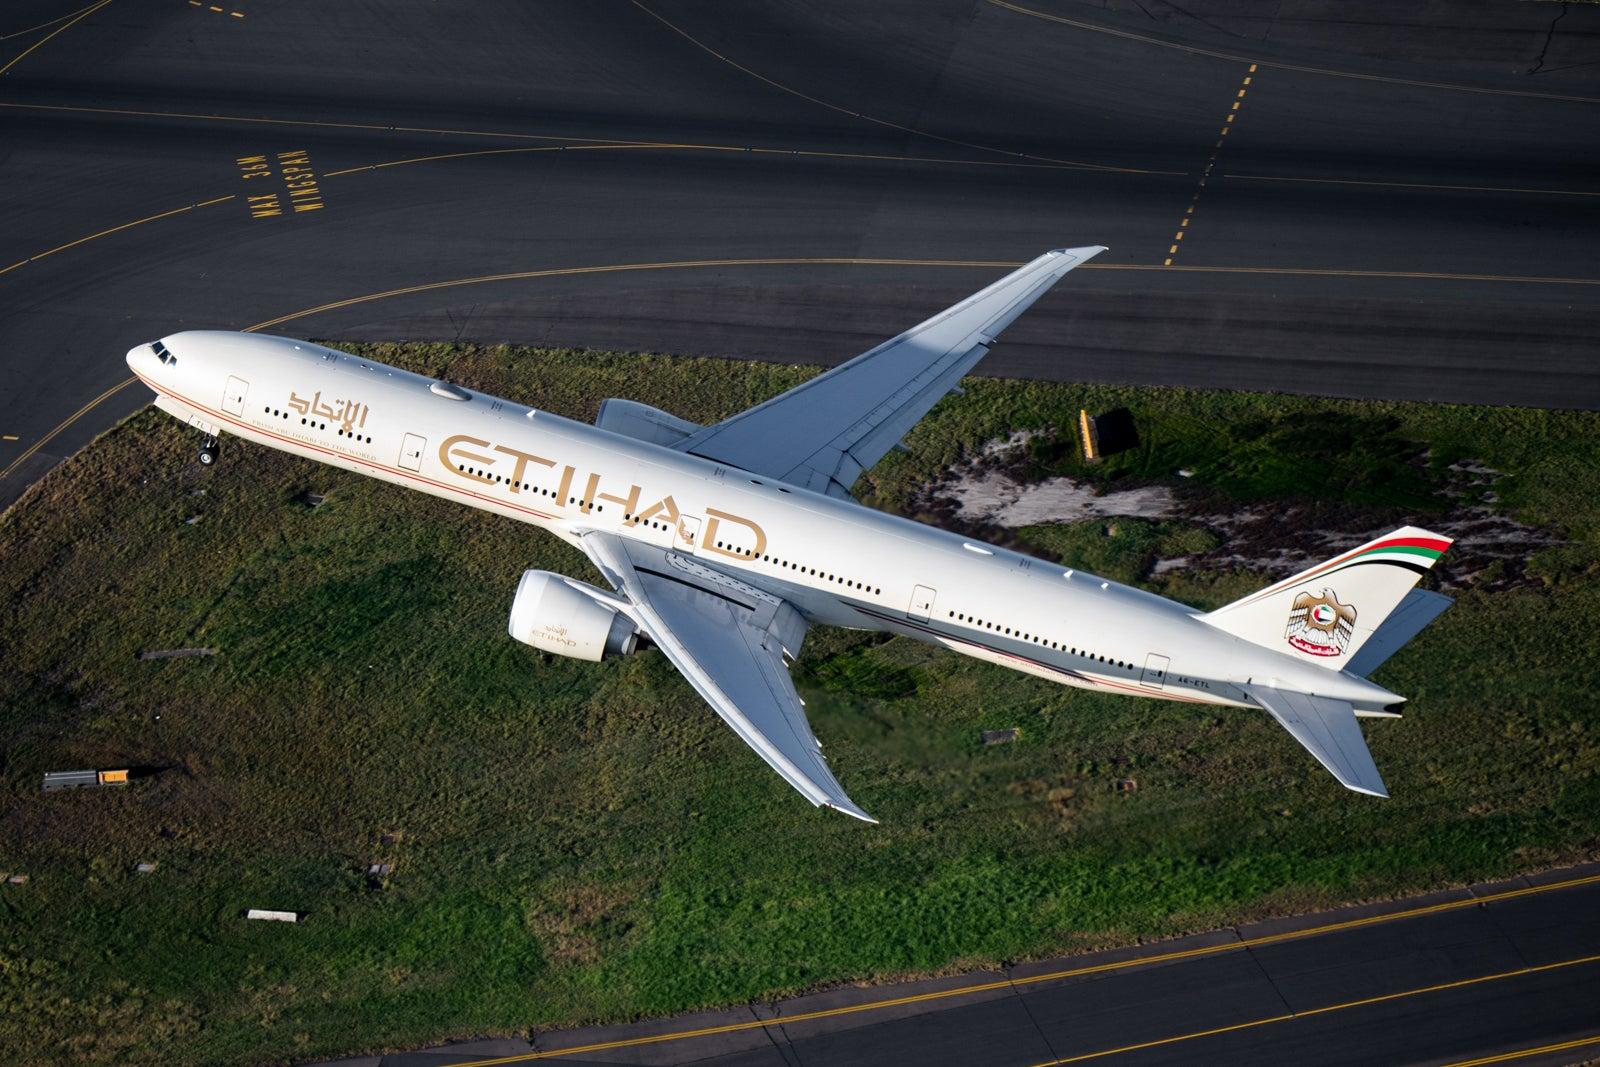 Etihad plans to retire Boeing 777 fleet in major wide-body shift